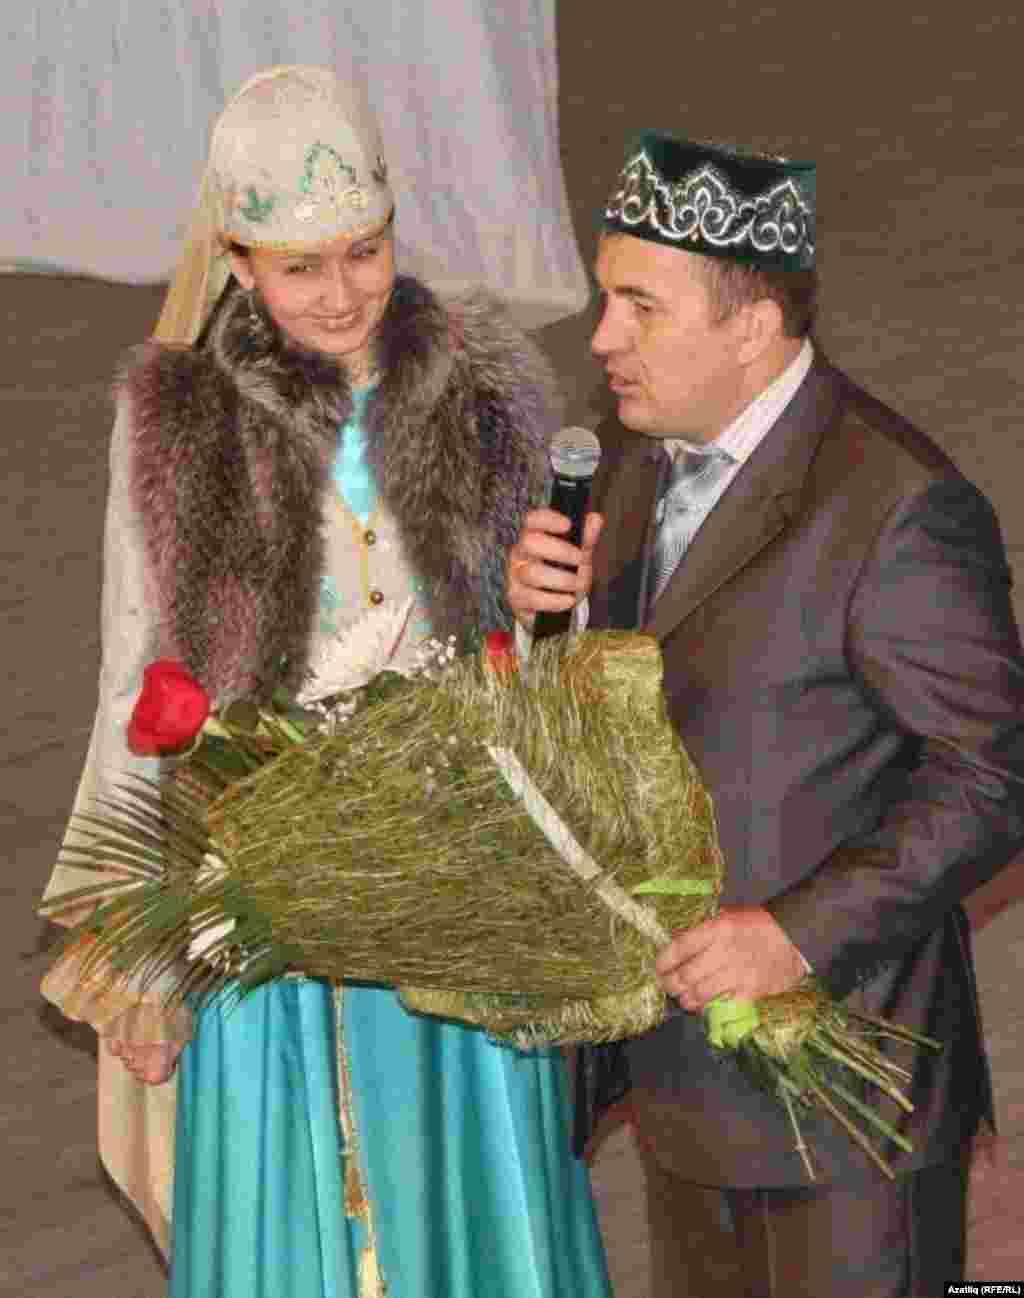 "21 ел буена ""Сөмбелә"" бәйрәмен алып баручы Шамил кызы Наилә Сабирҗановага үз рәхмәтләрен шәһәр мохтарияте җитәкчесе Рифкат Хуҗин җиткезә."